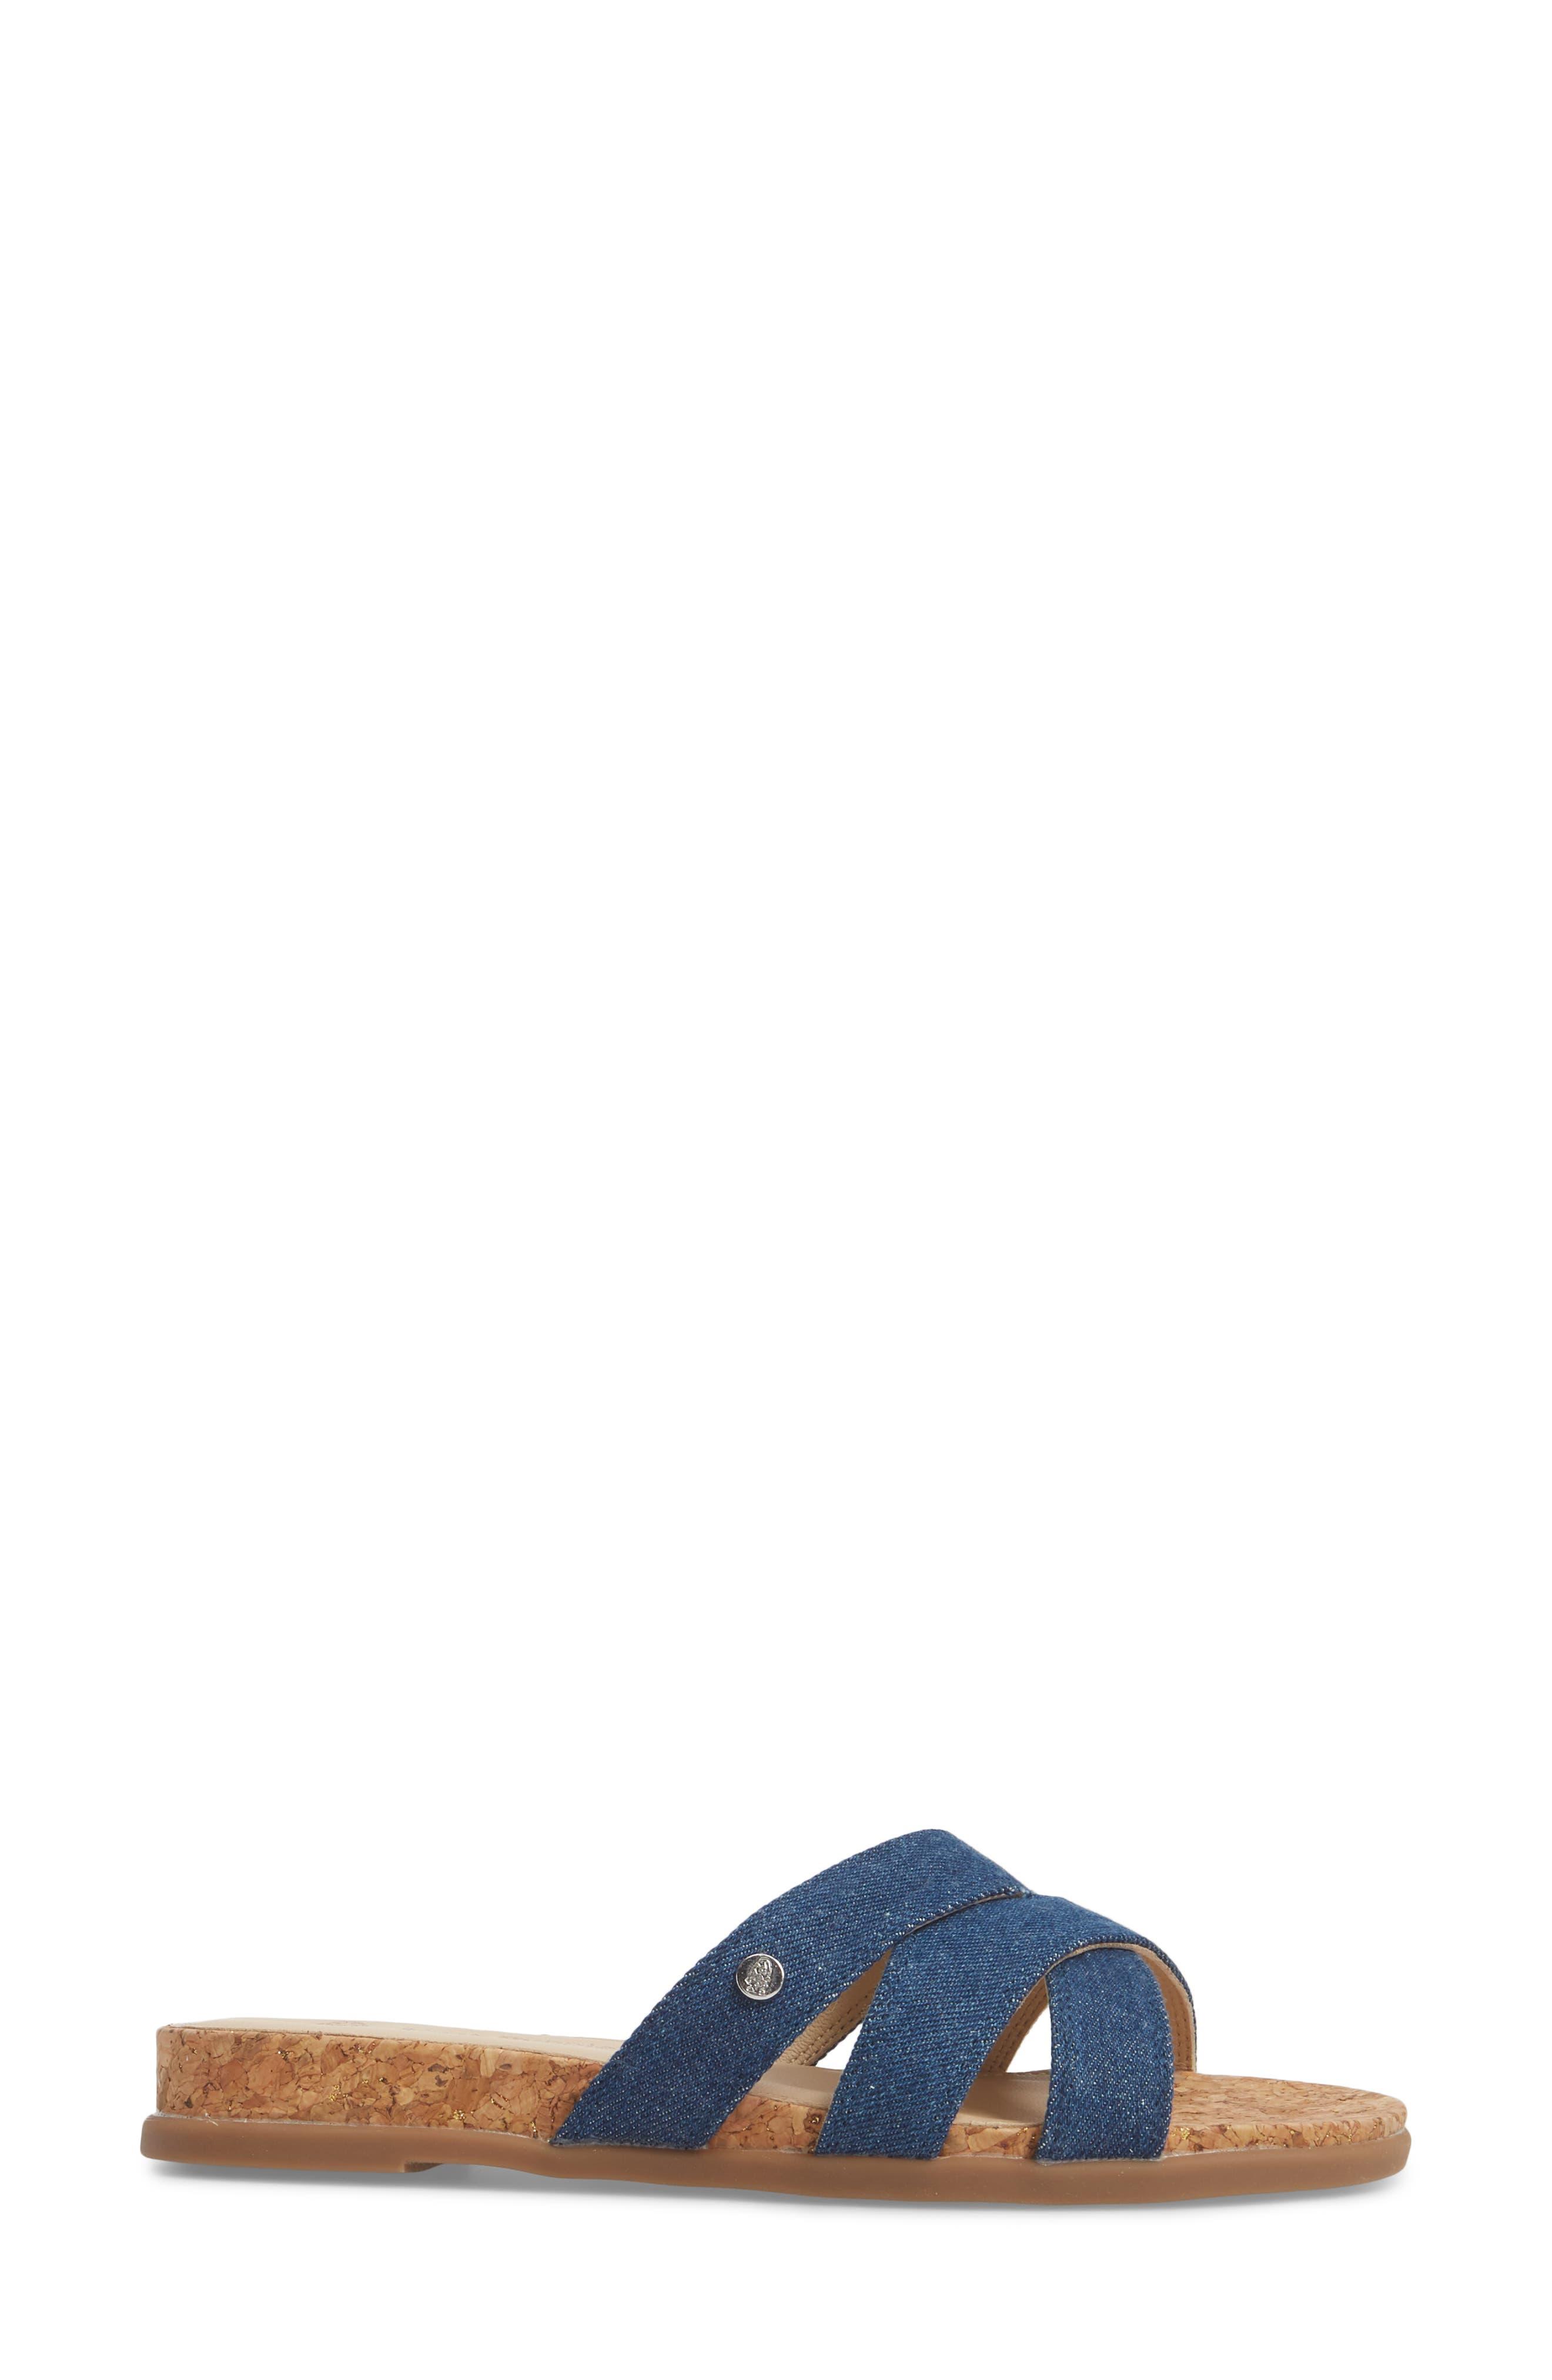 Dalmatian Slide Sandal,                             Alternate thumbnail 9, color,